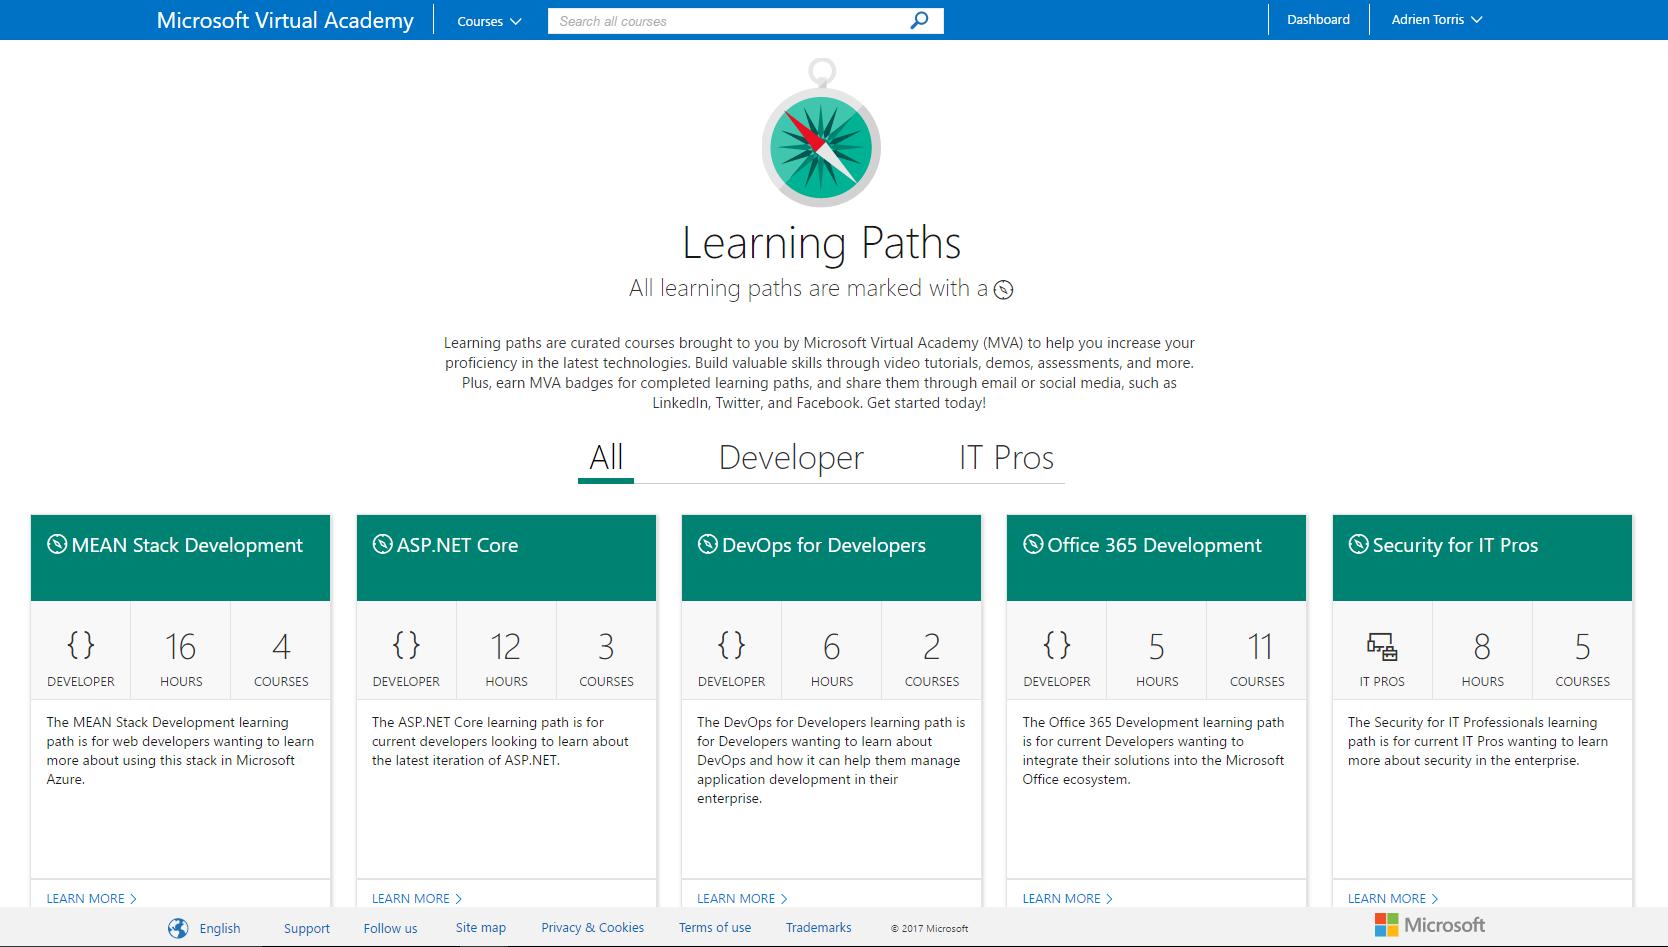 Microsoft virtual academy mva introduices the learning paths learning paths on the microsoft virtual academy mva 1betcityfo Gallery